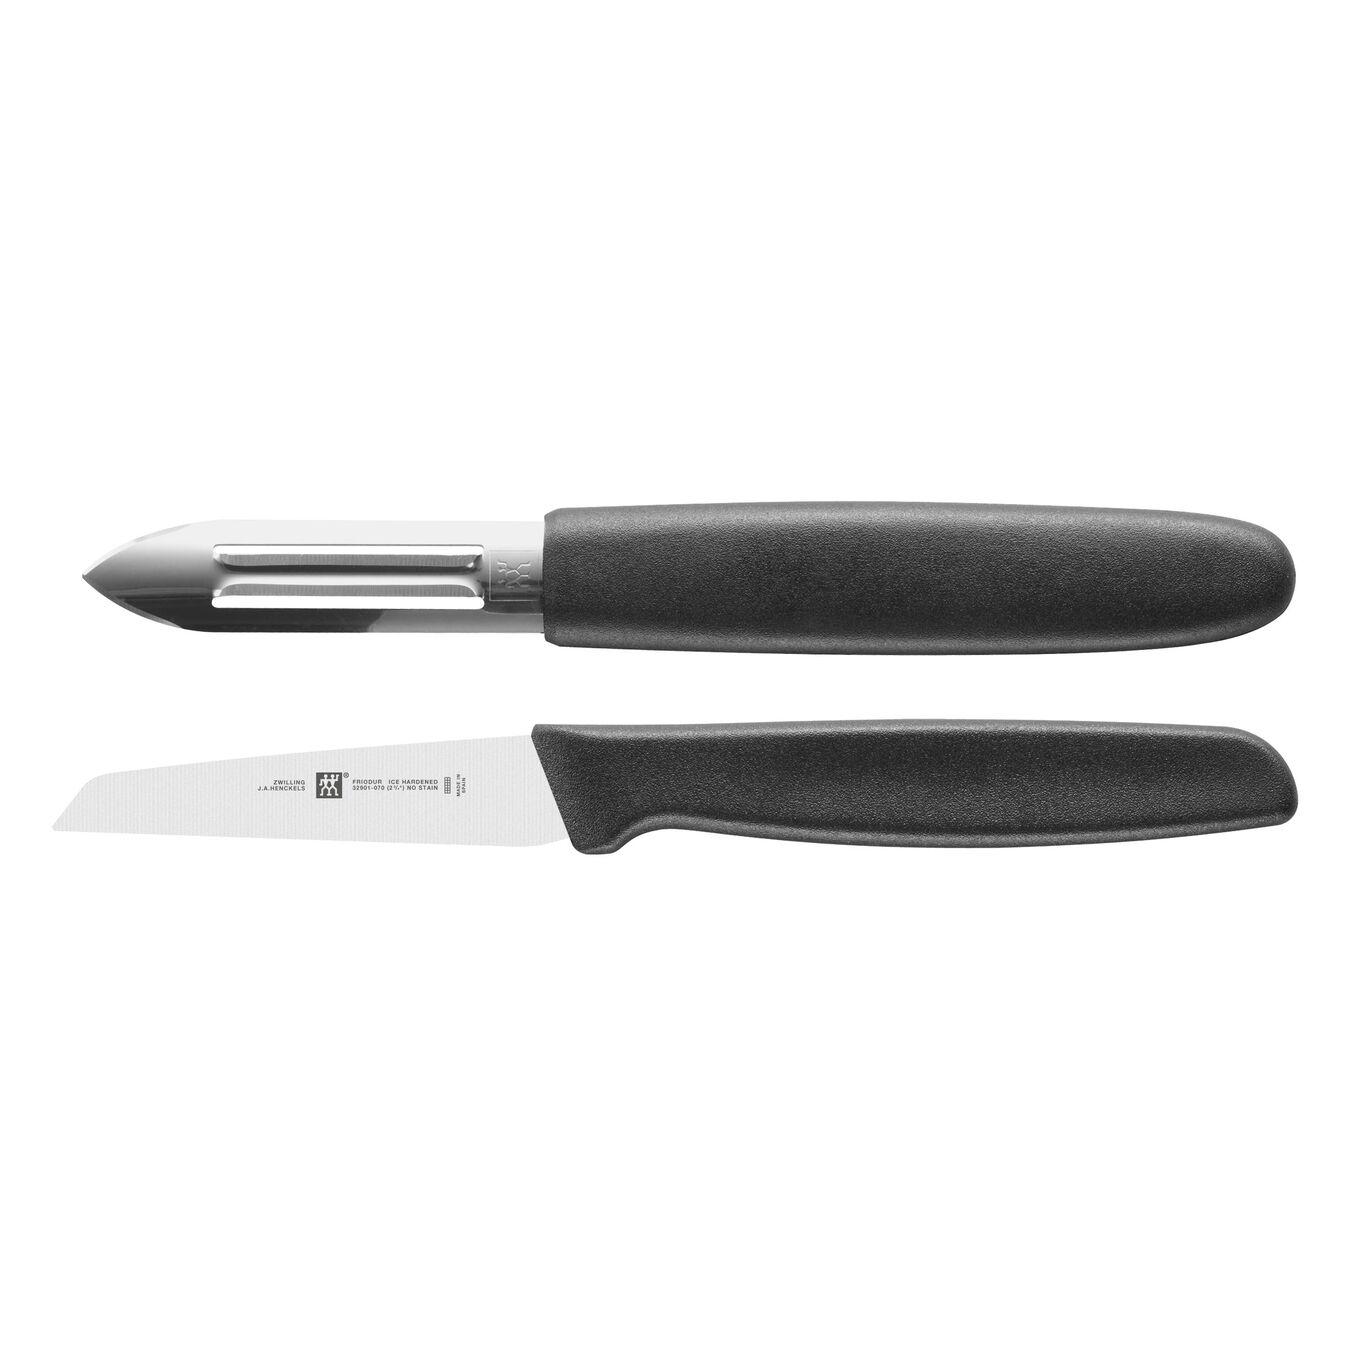 Messerset 2-tlg, Schwarz,,large 1